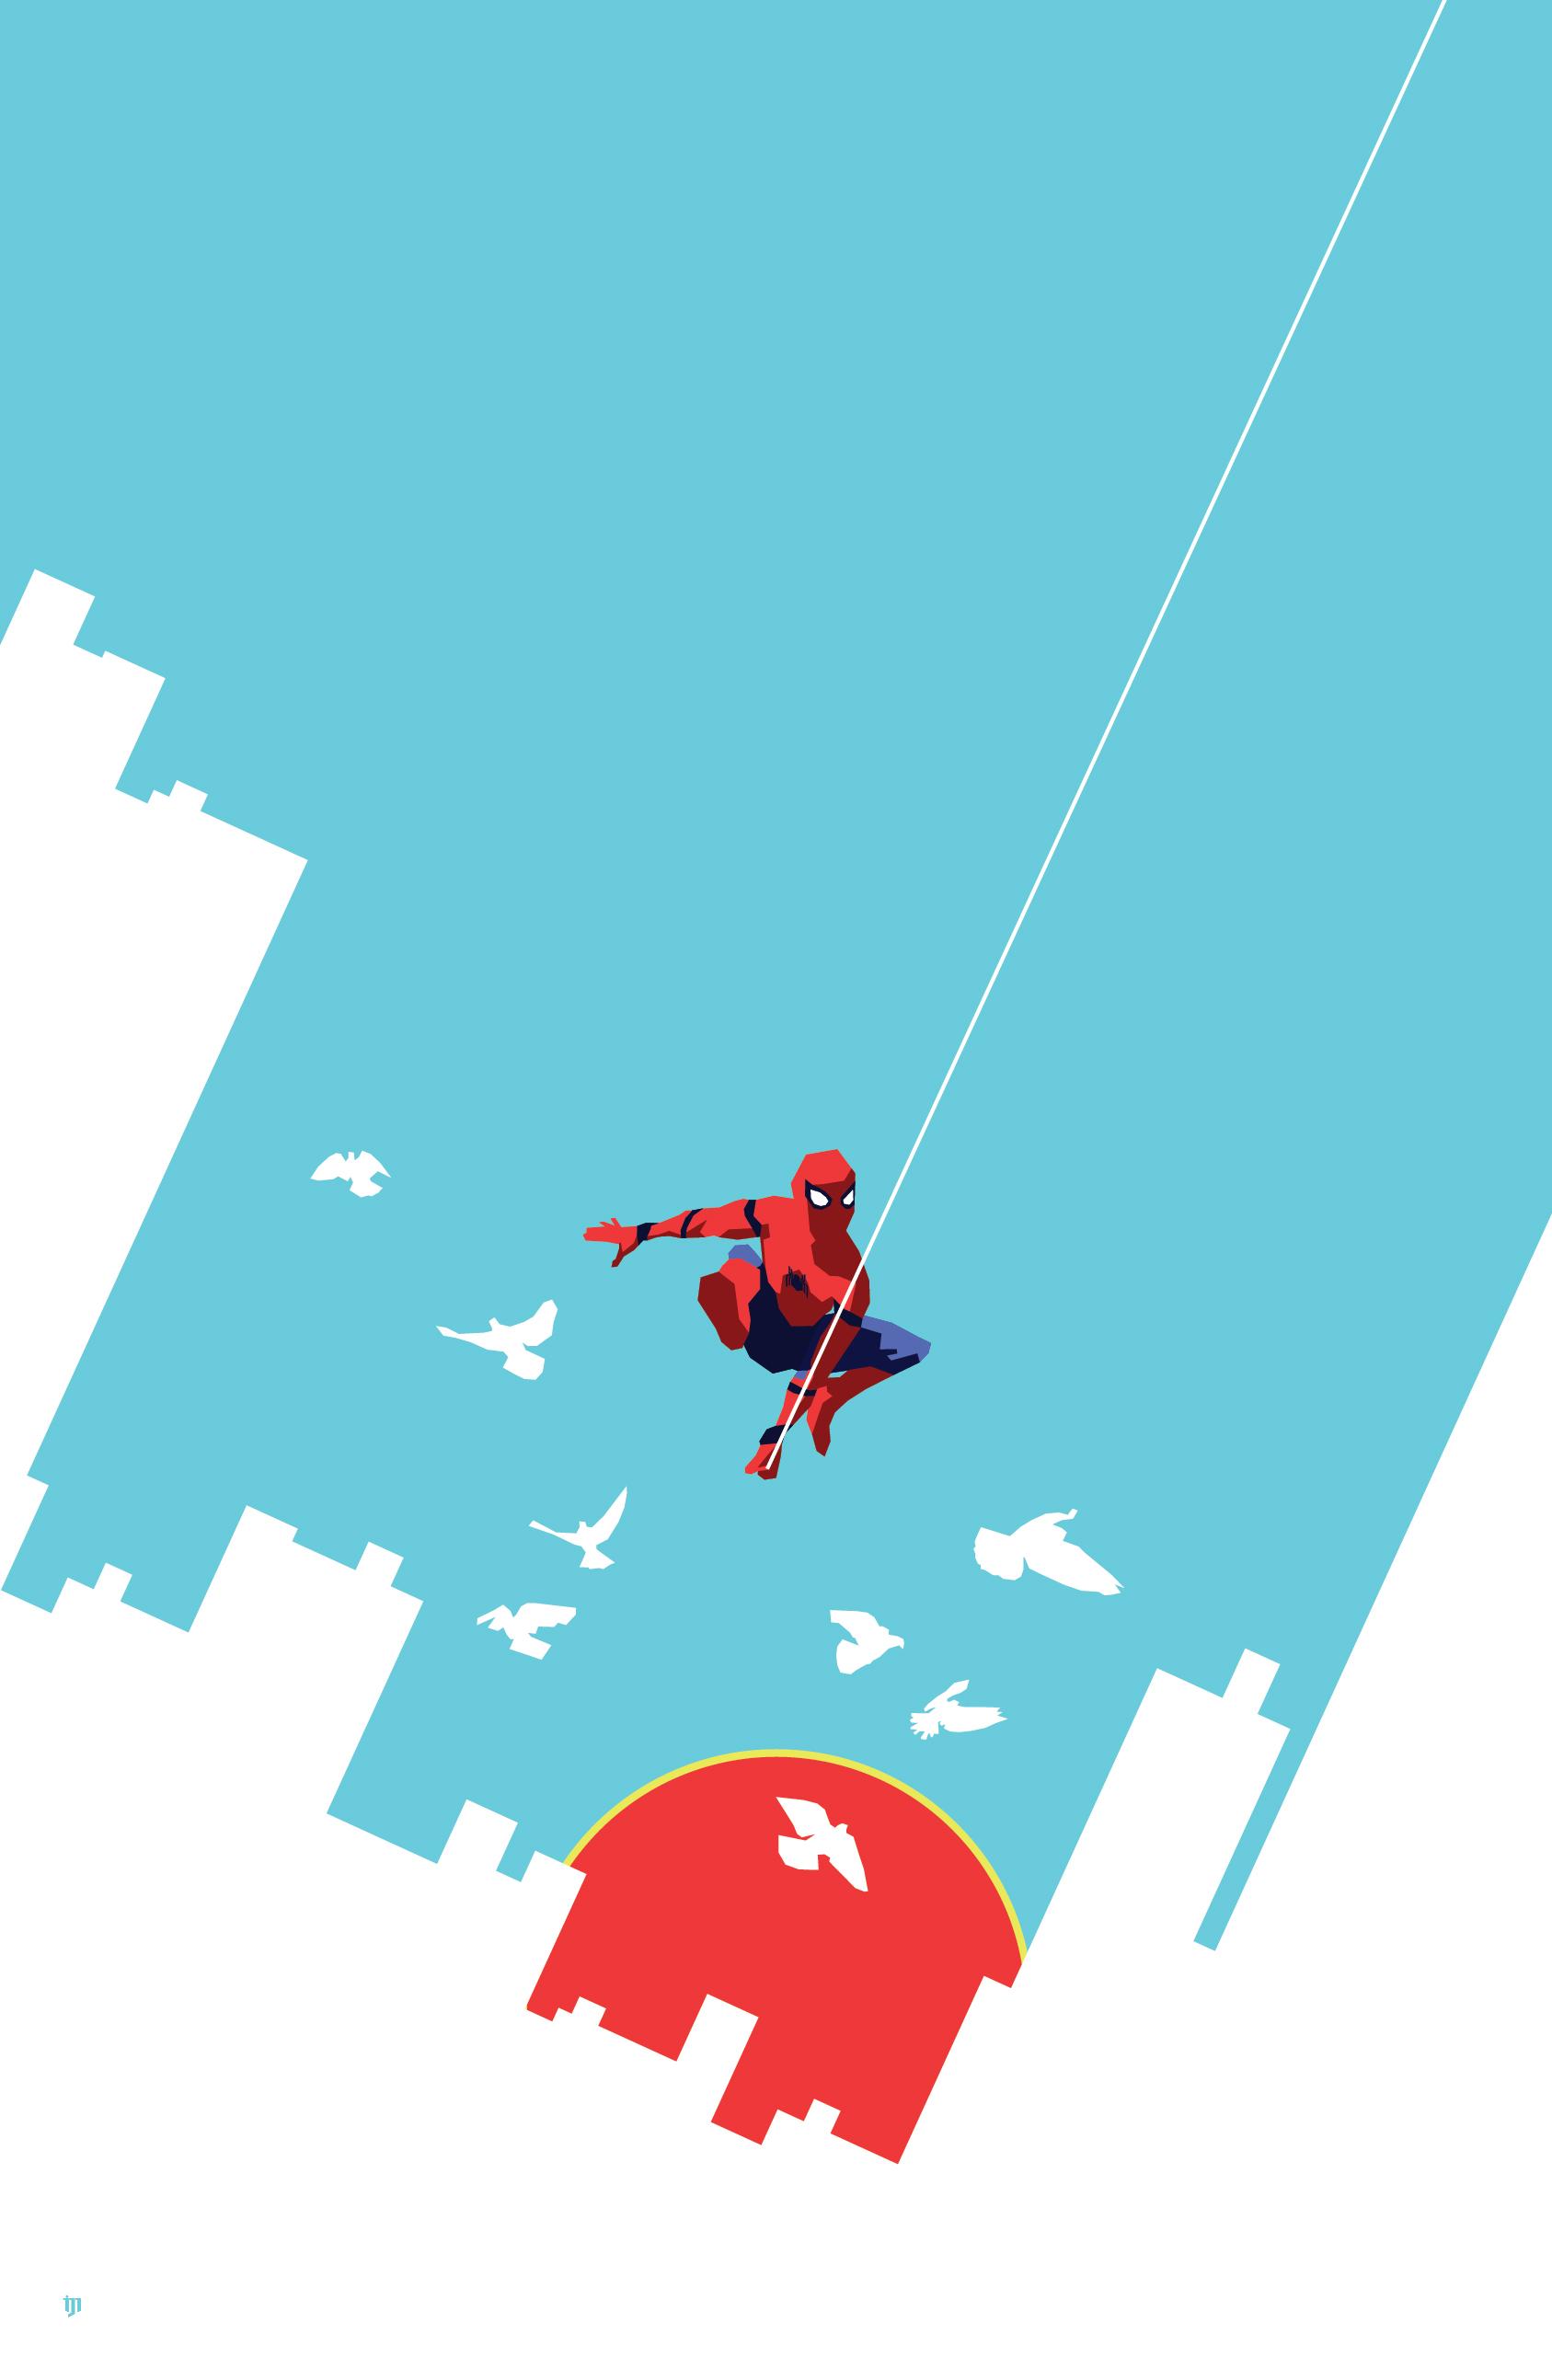 Spiderman-07.jpg